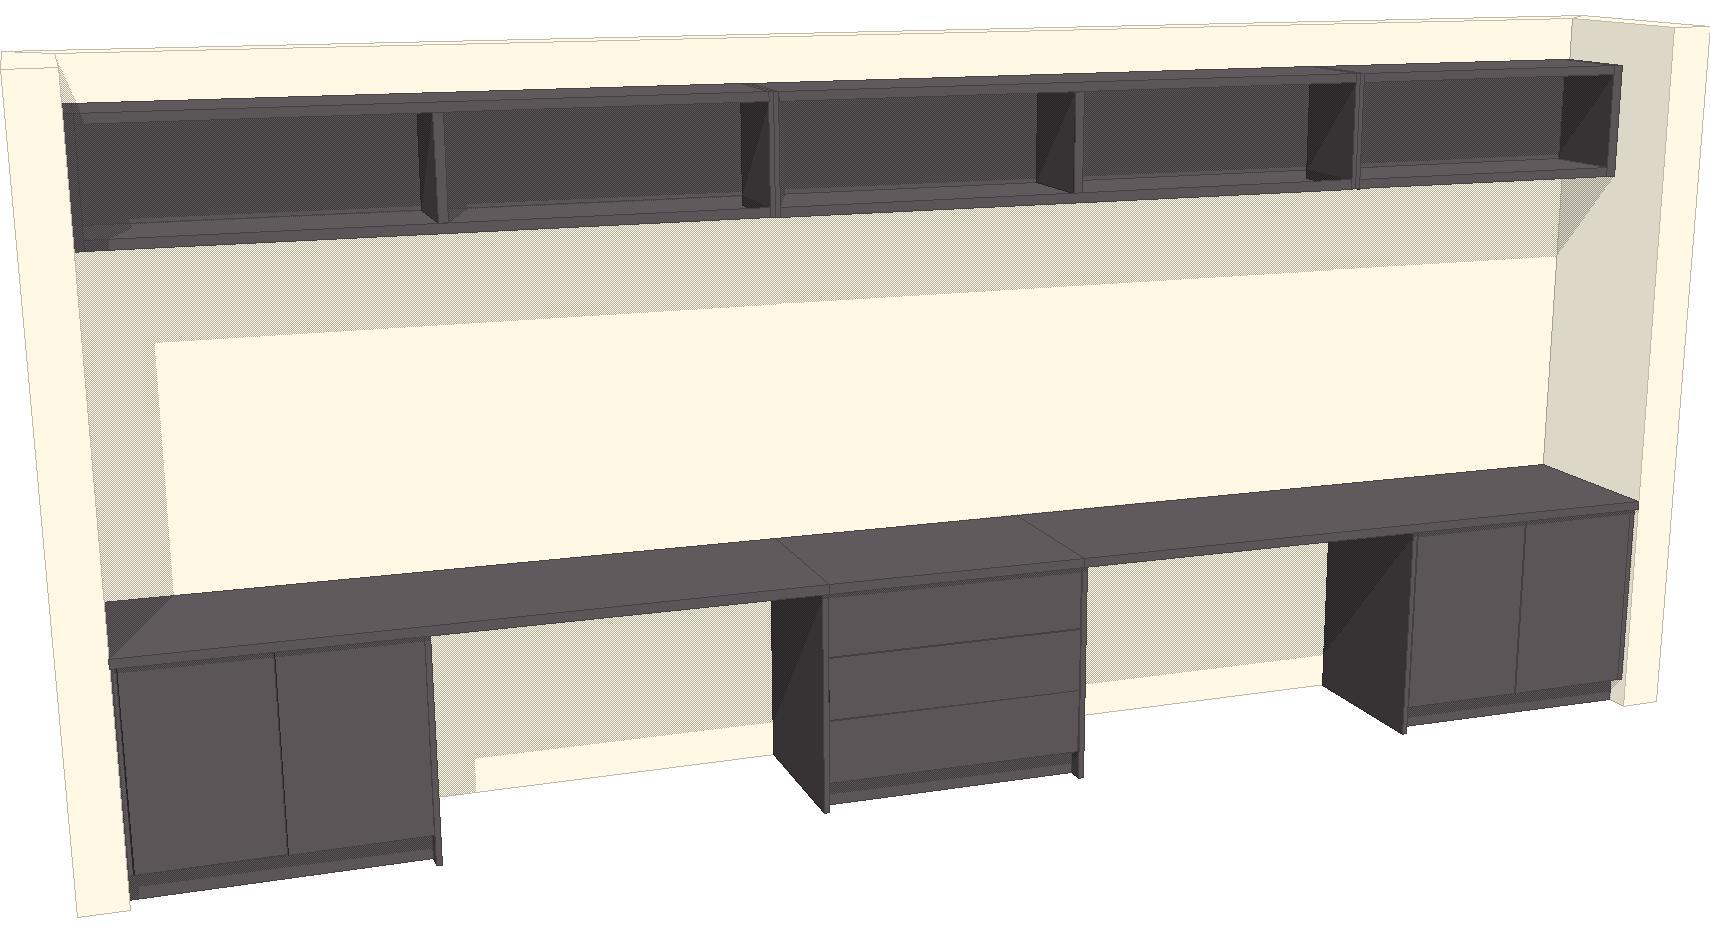 U2 Study Desk 3d Design From Laptop